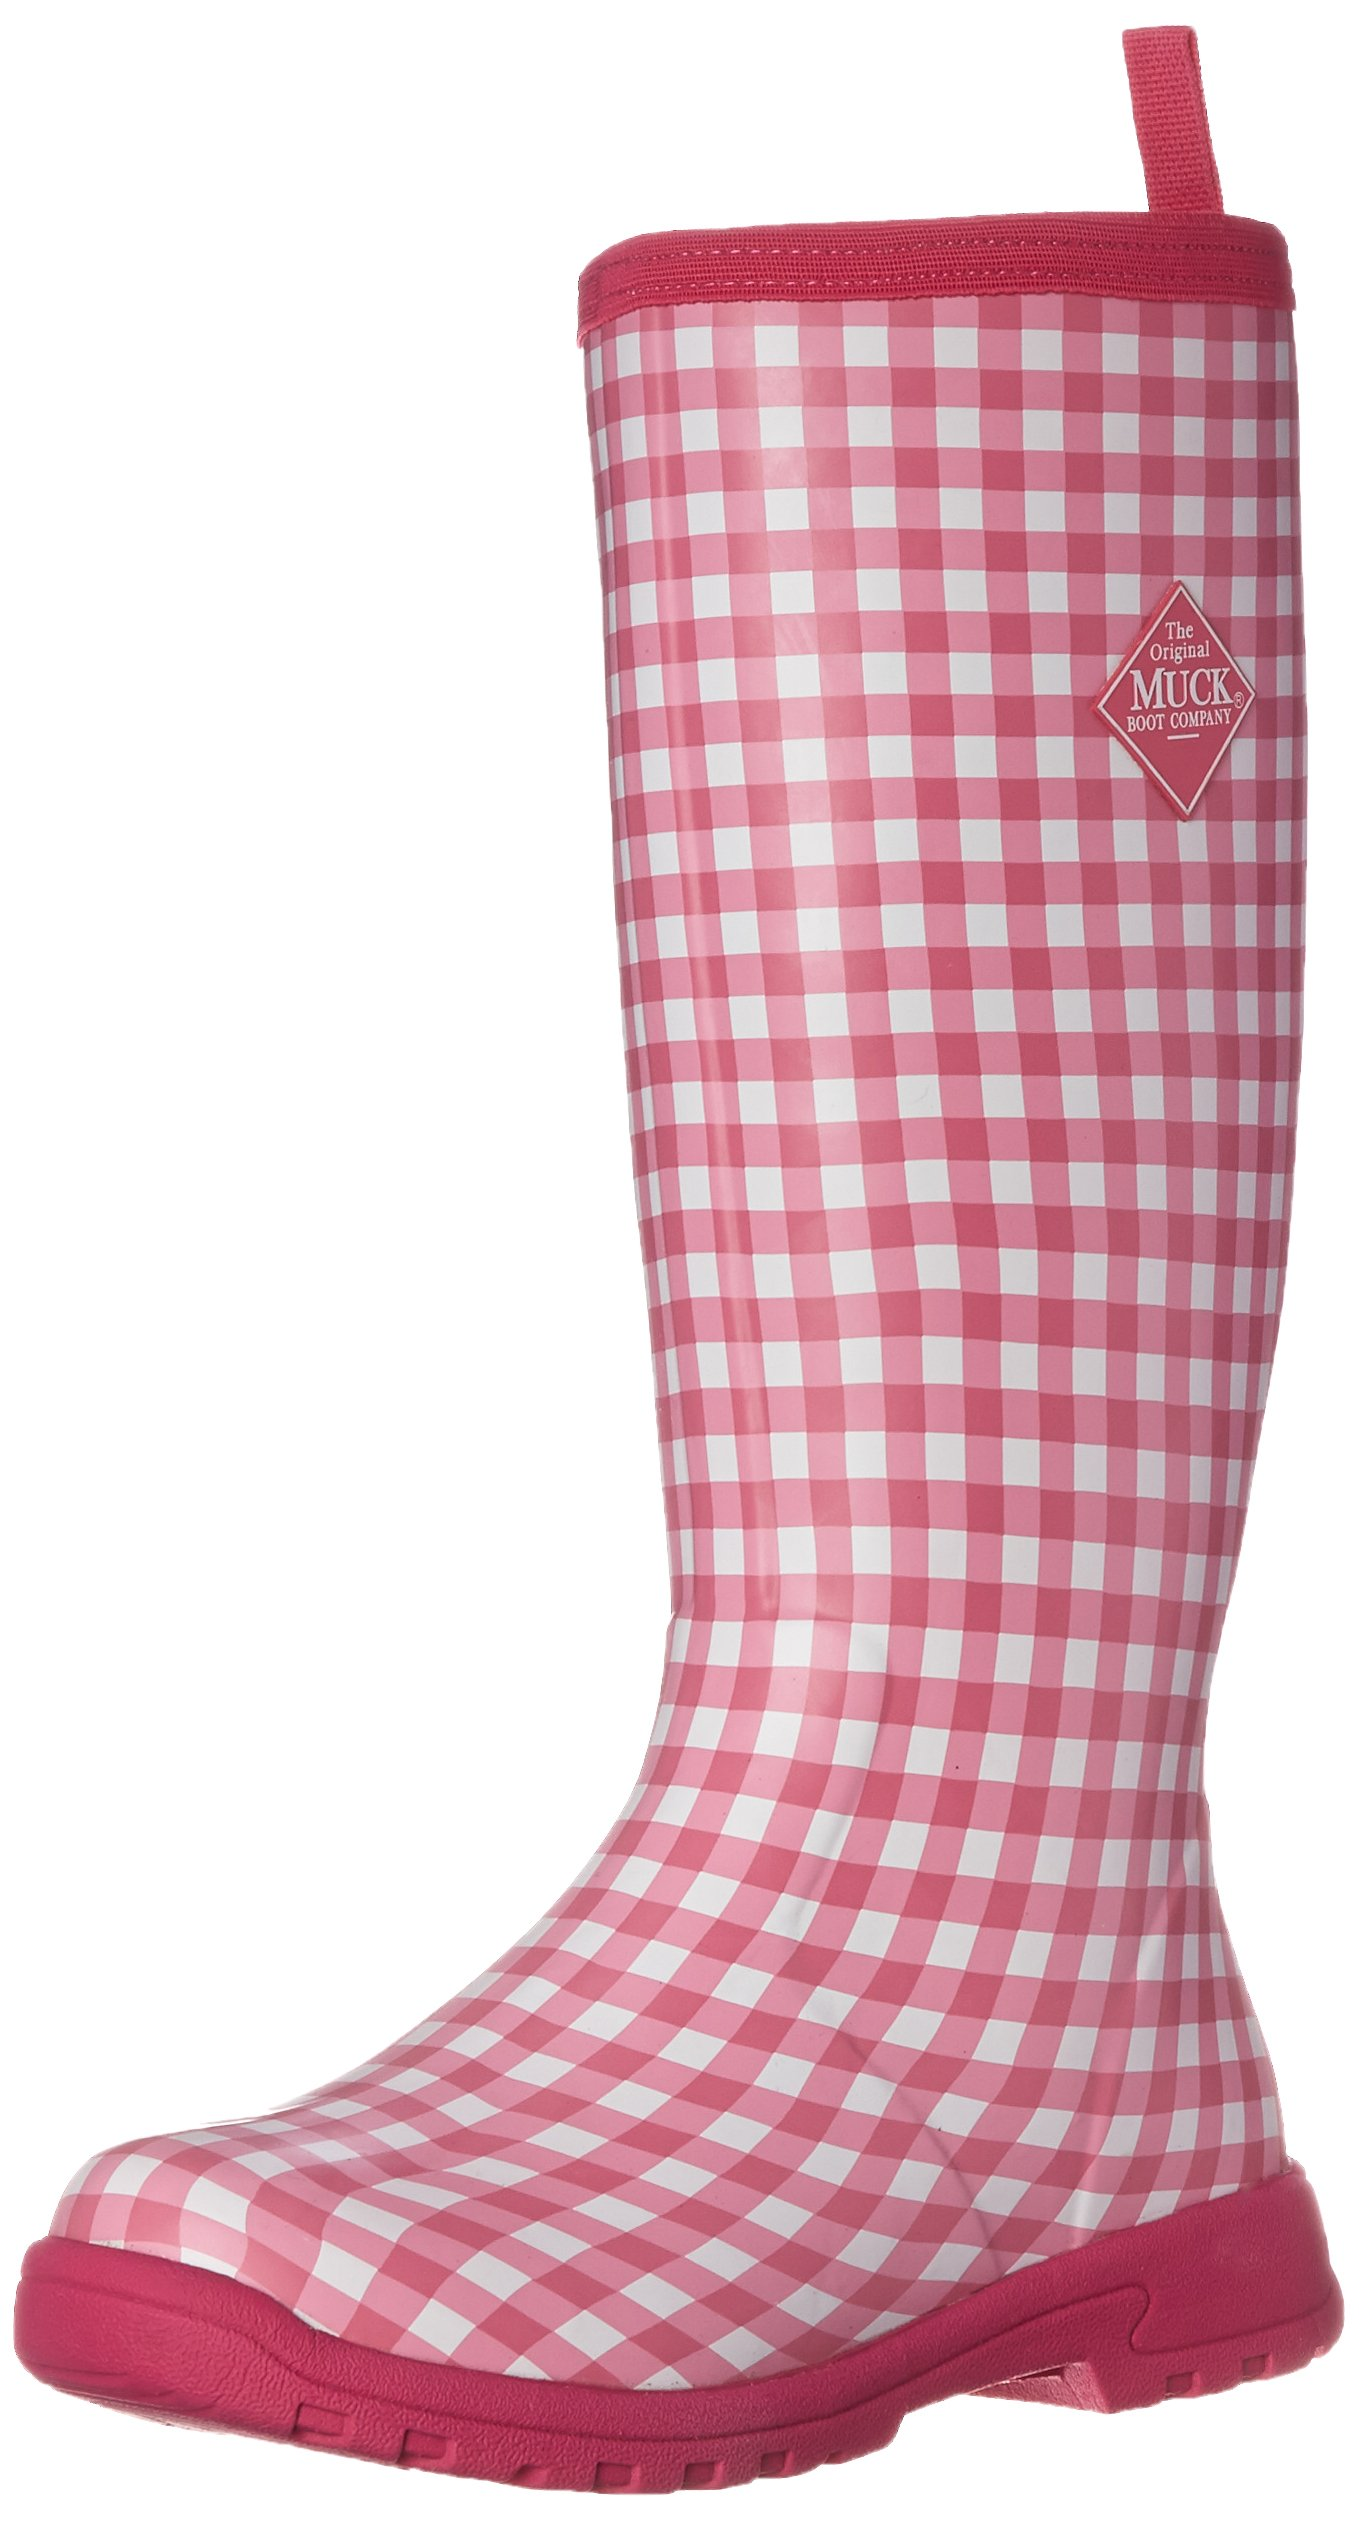 MuckBoots Women's Breezy Tall Insulated Rain Boot, Pink Gingham, 9 M US